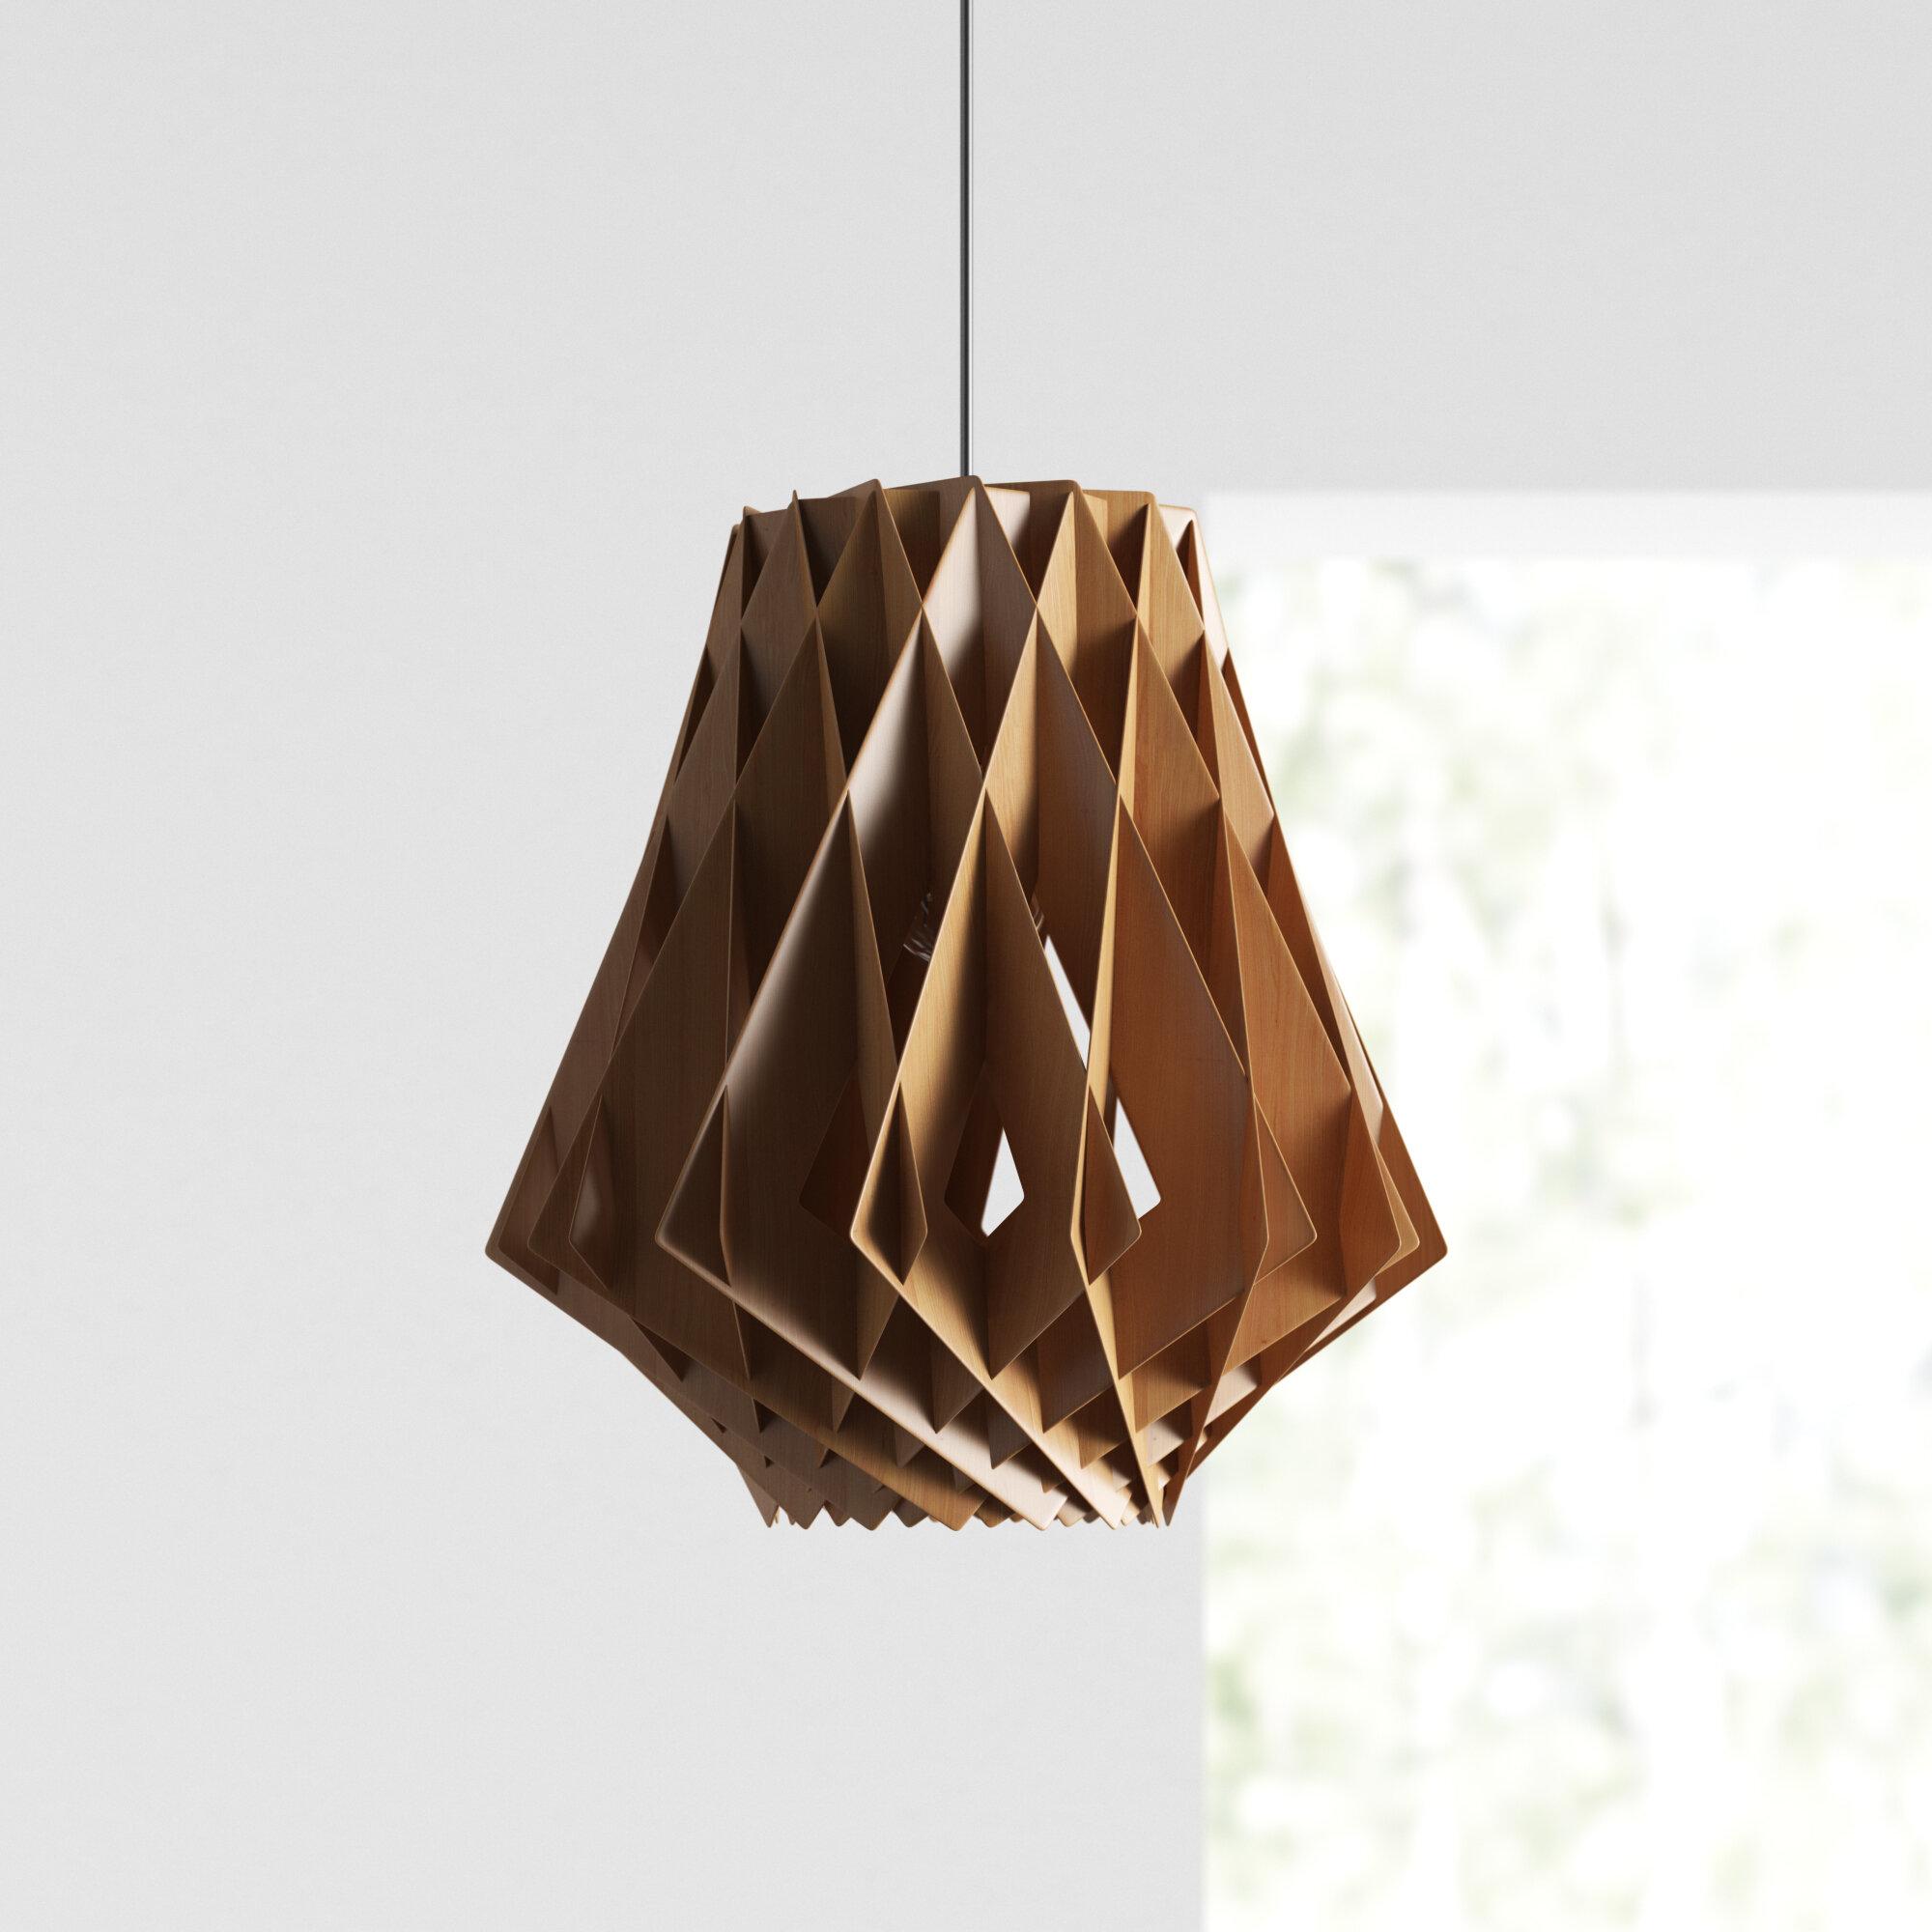 Sayer 1 Light Single Geometric Pendant Reviews Allmodern